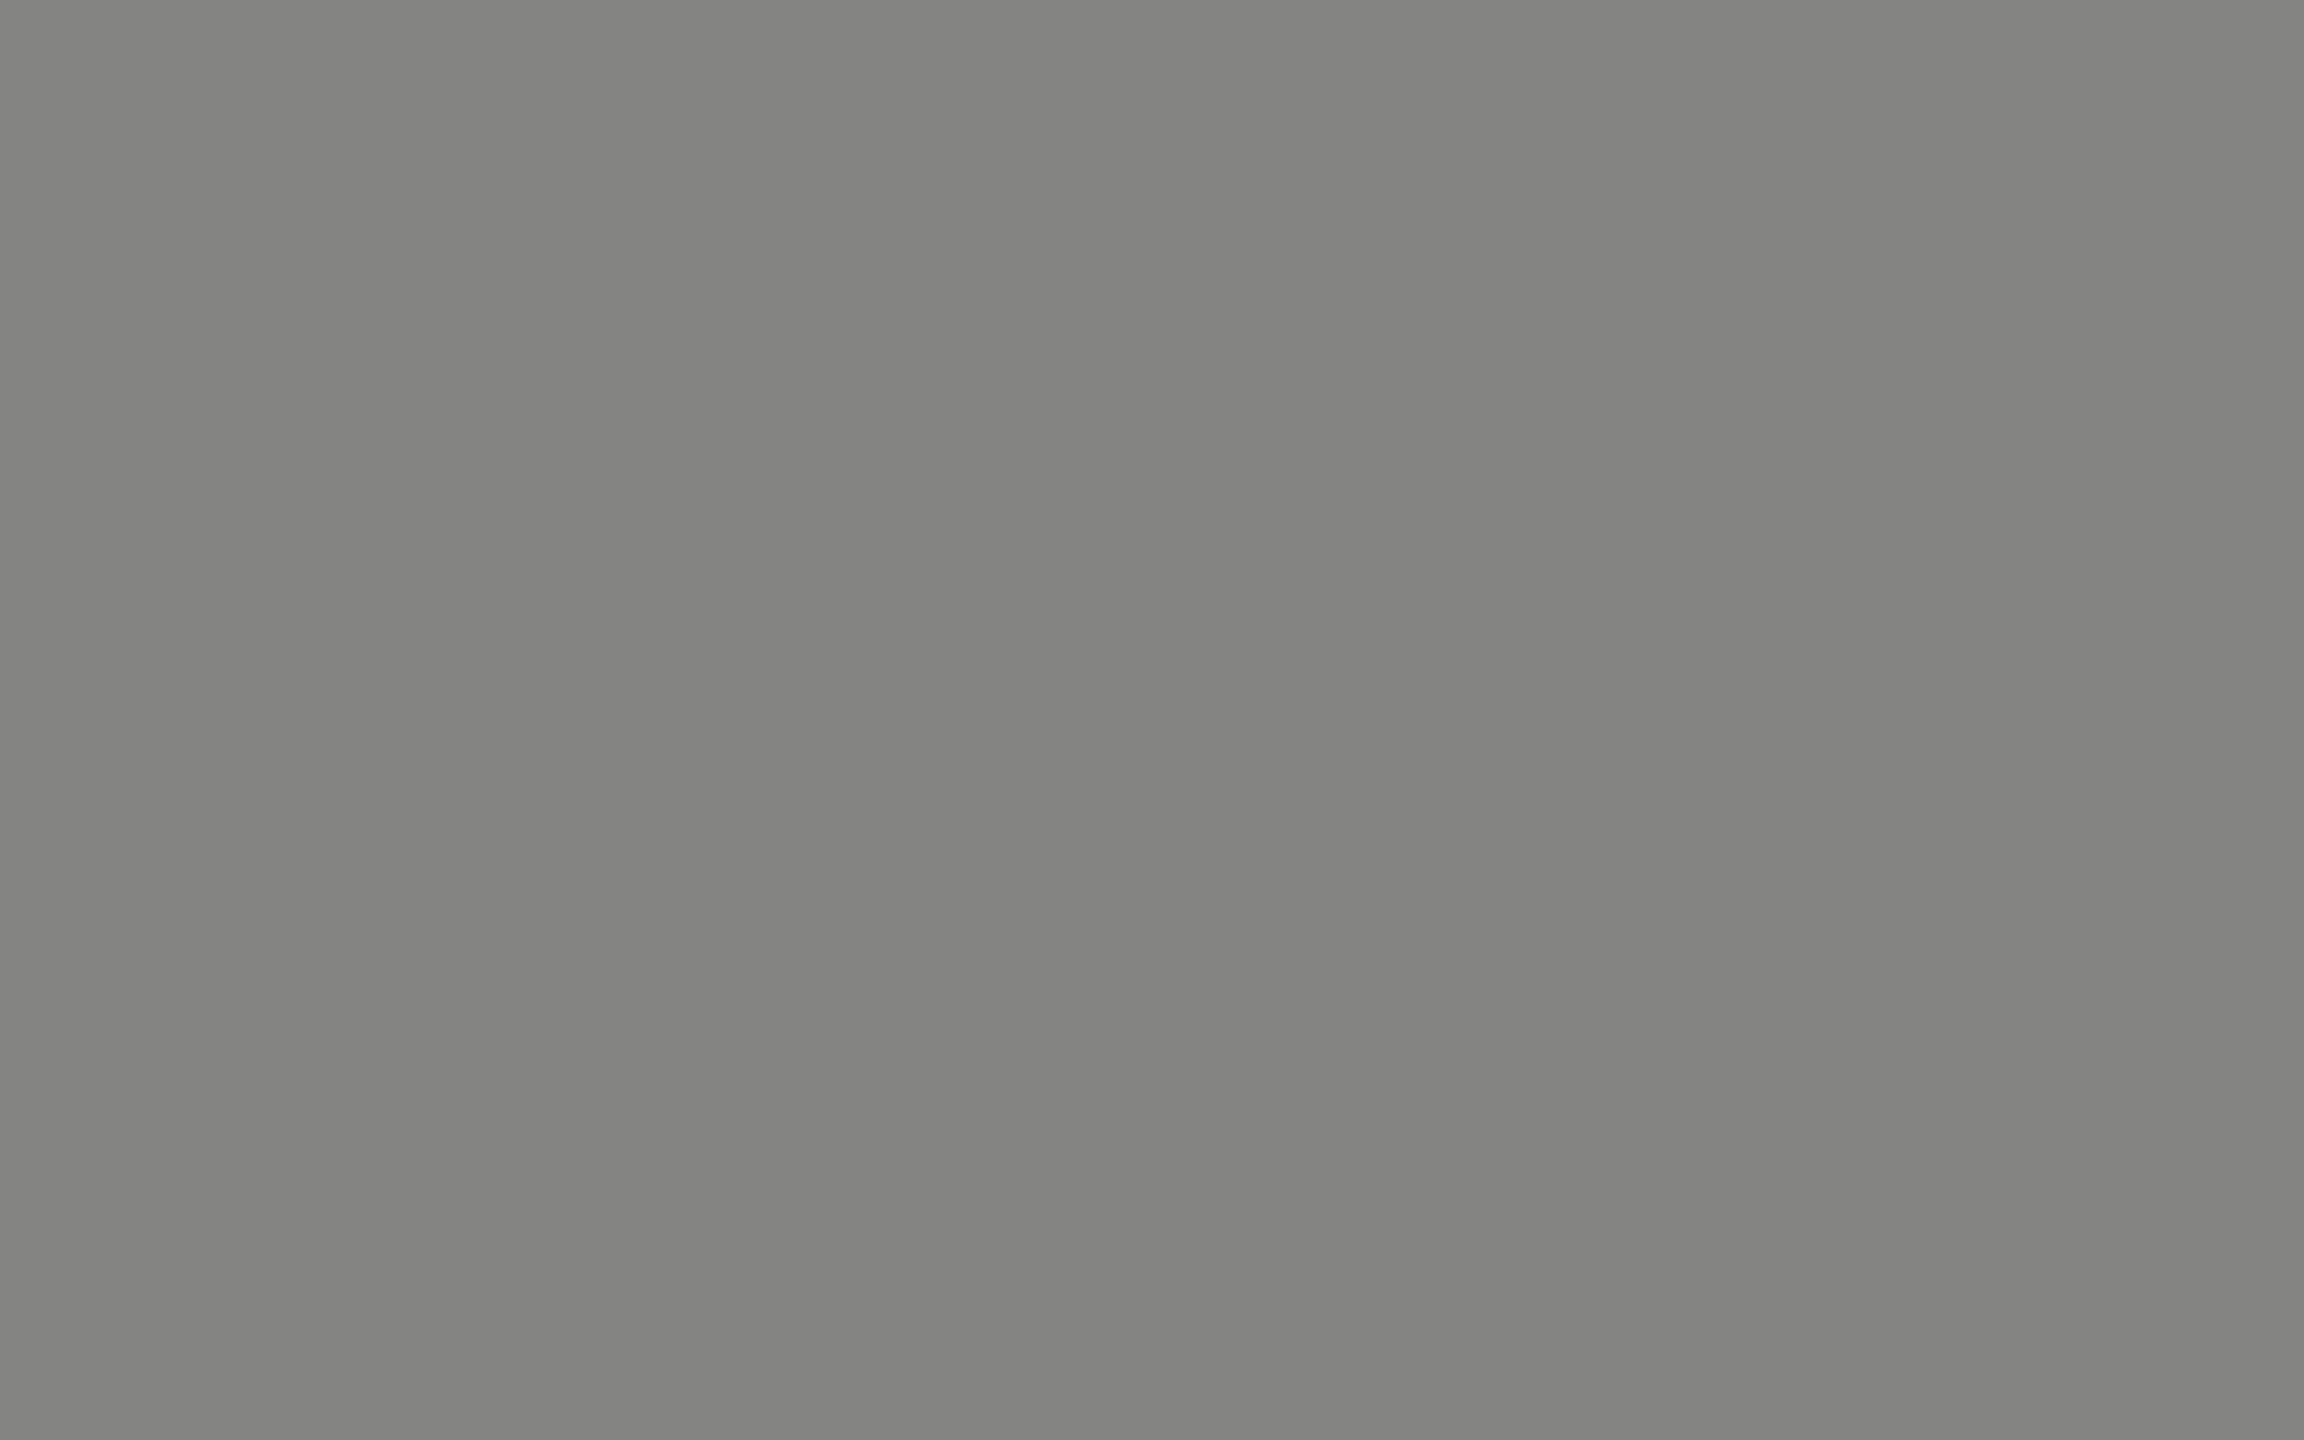 2304x1440 Battleship Grey Solid Color Background